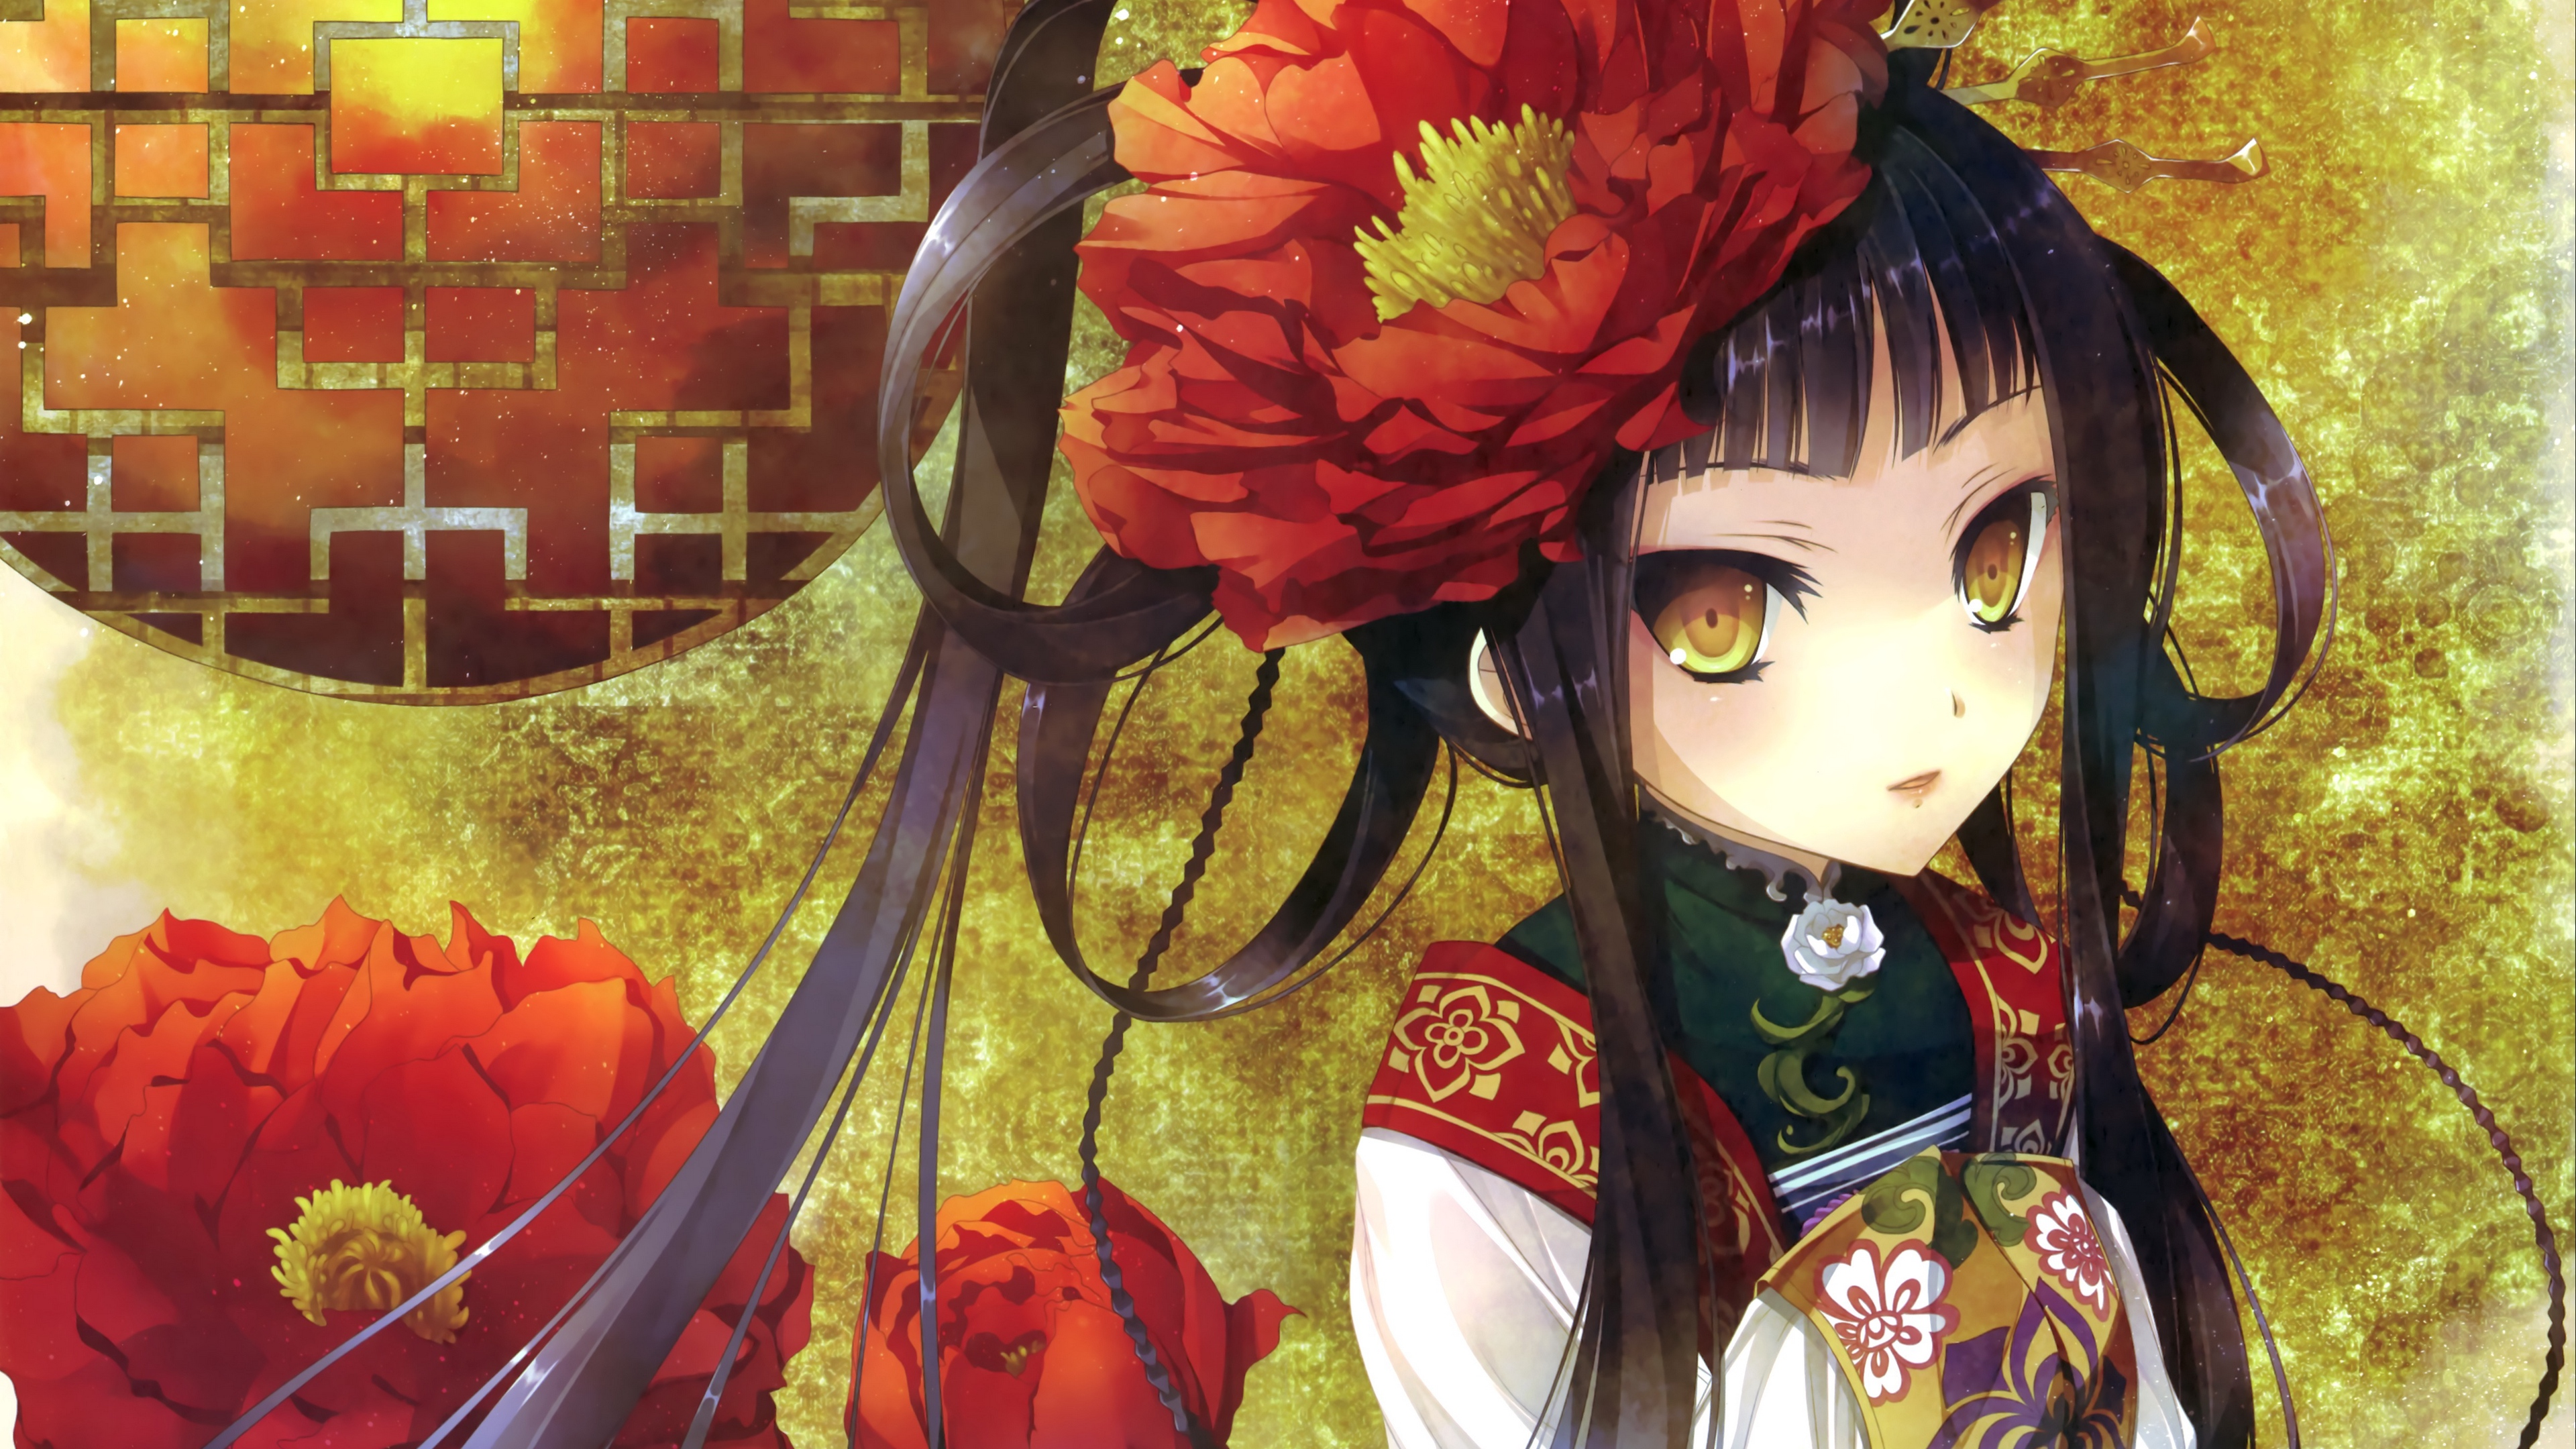 katagiri hinata girl kimono art 4k 1541976040 - katagiri hinata, girl, kimono, art 4k - Kimono, katagiri hinata, Girl